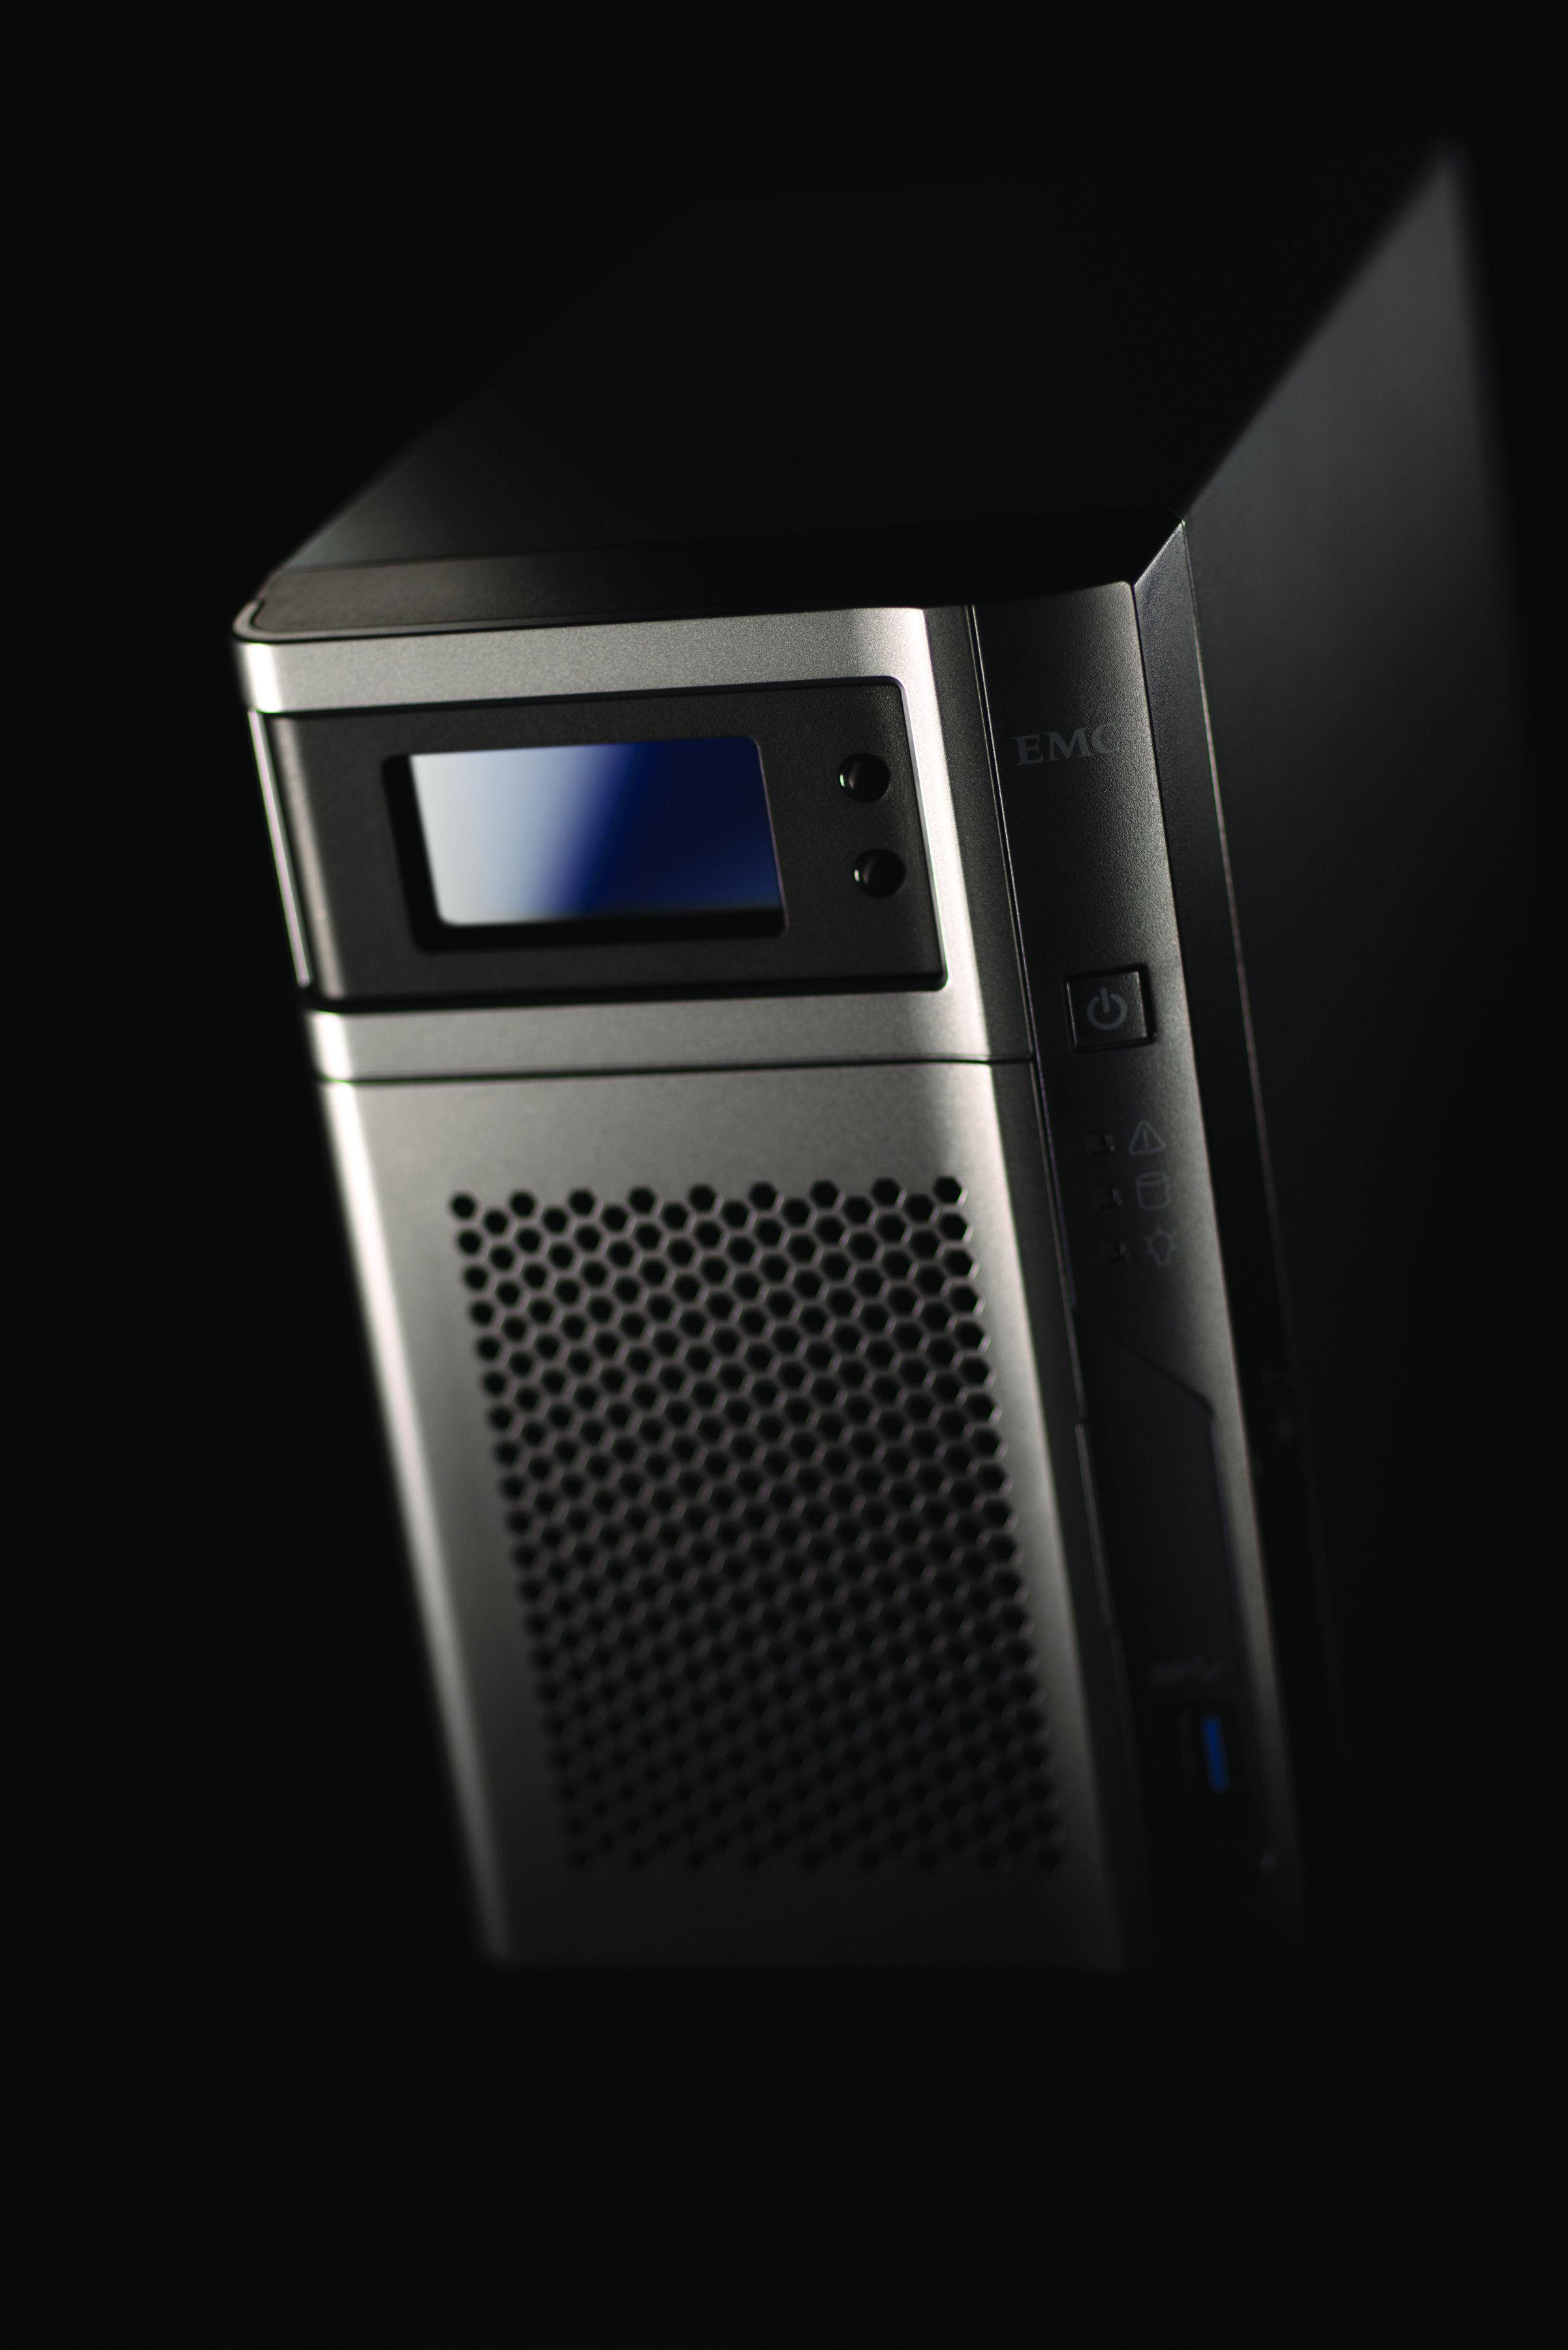 LenovoEMC nagrywa w sieci